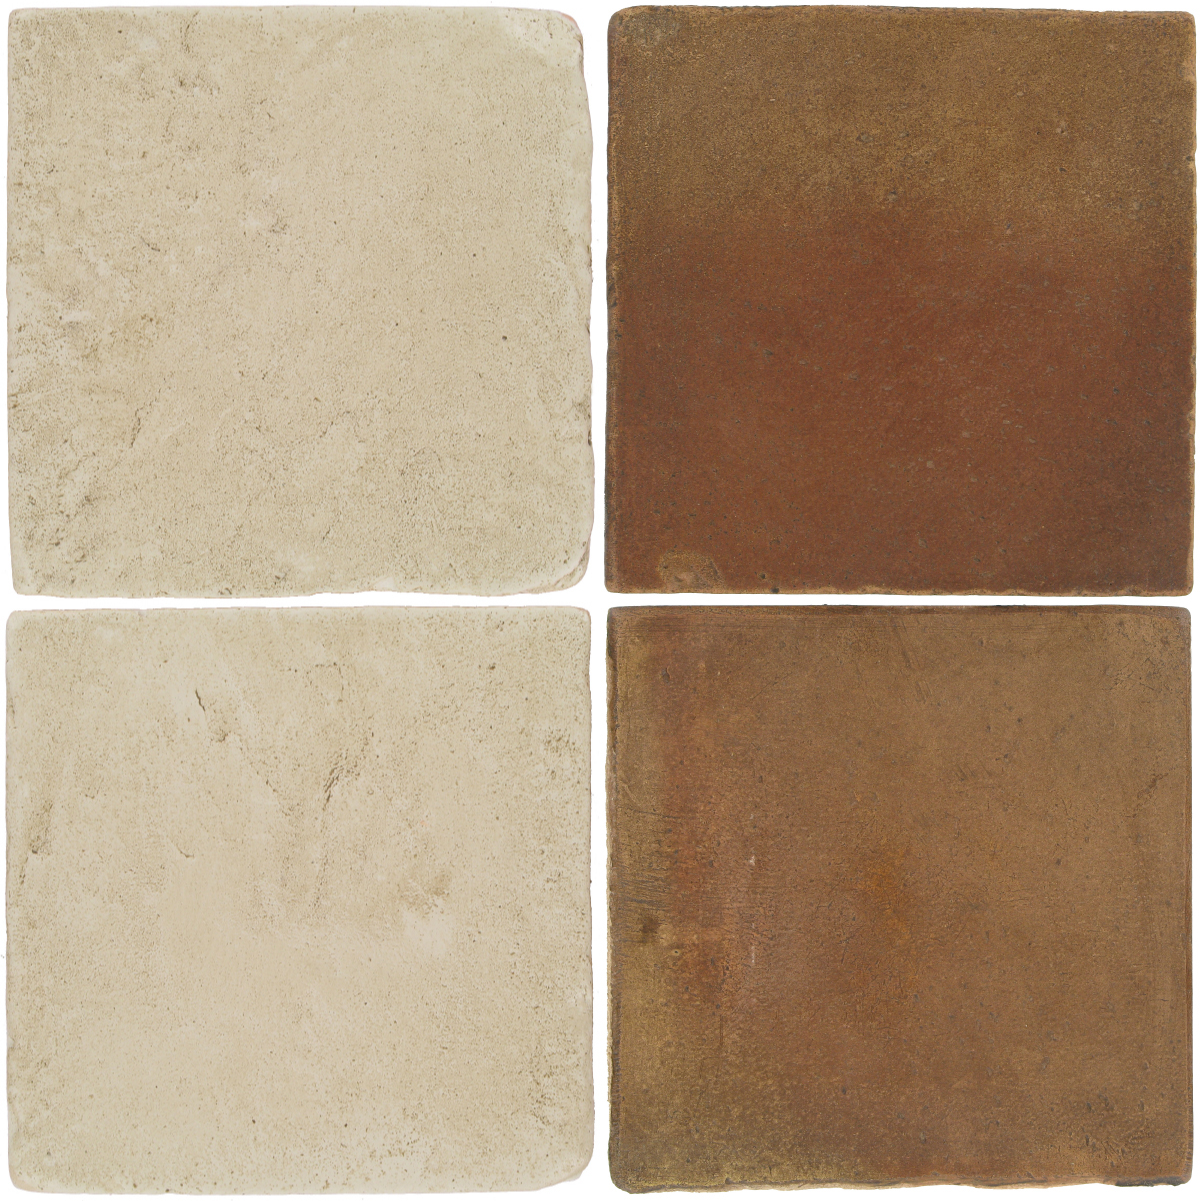 Pedralbes Antique Terracotta  2 Color Combinations  VTG-PGLW Glacier White + OHS-PSCM Camel Brown